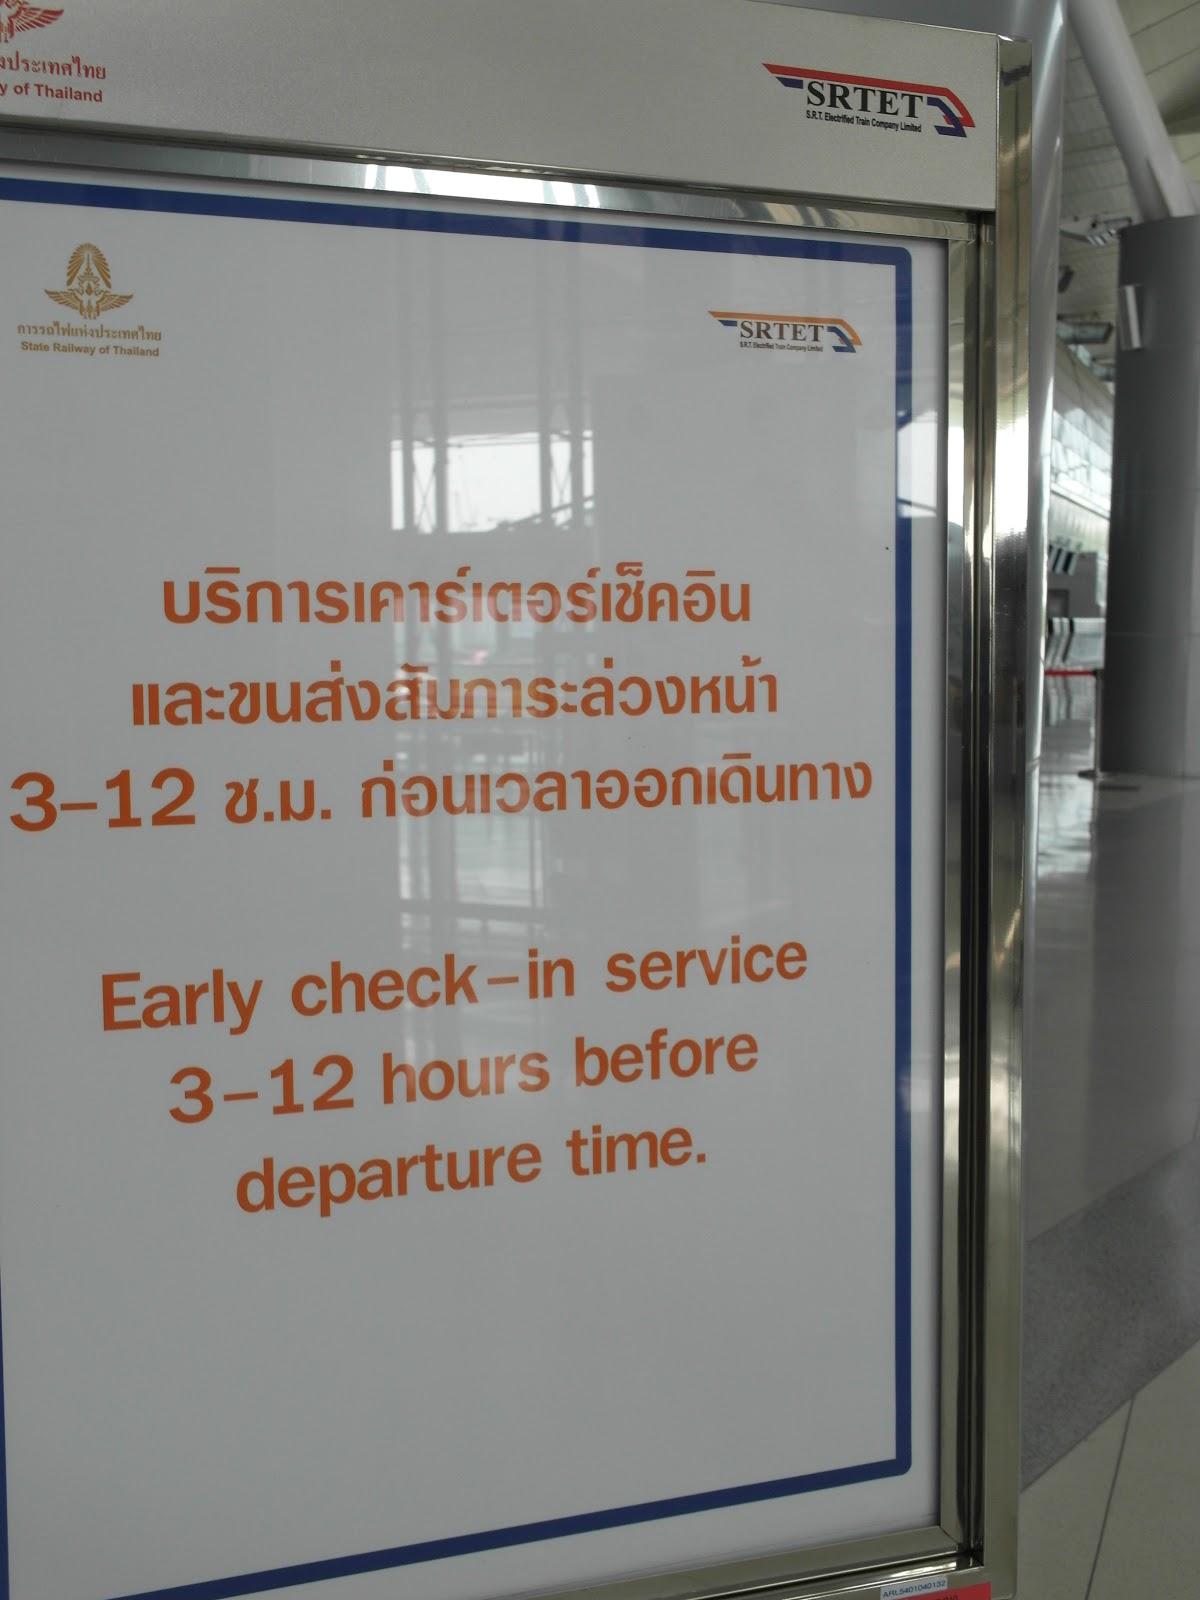 Thai Fever 泰 曼 熱: 曼谷機場捷運 - 泰航提早check-in @ Airport Link Makkasan station